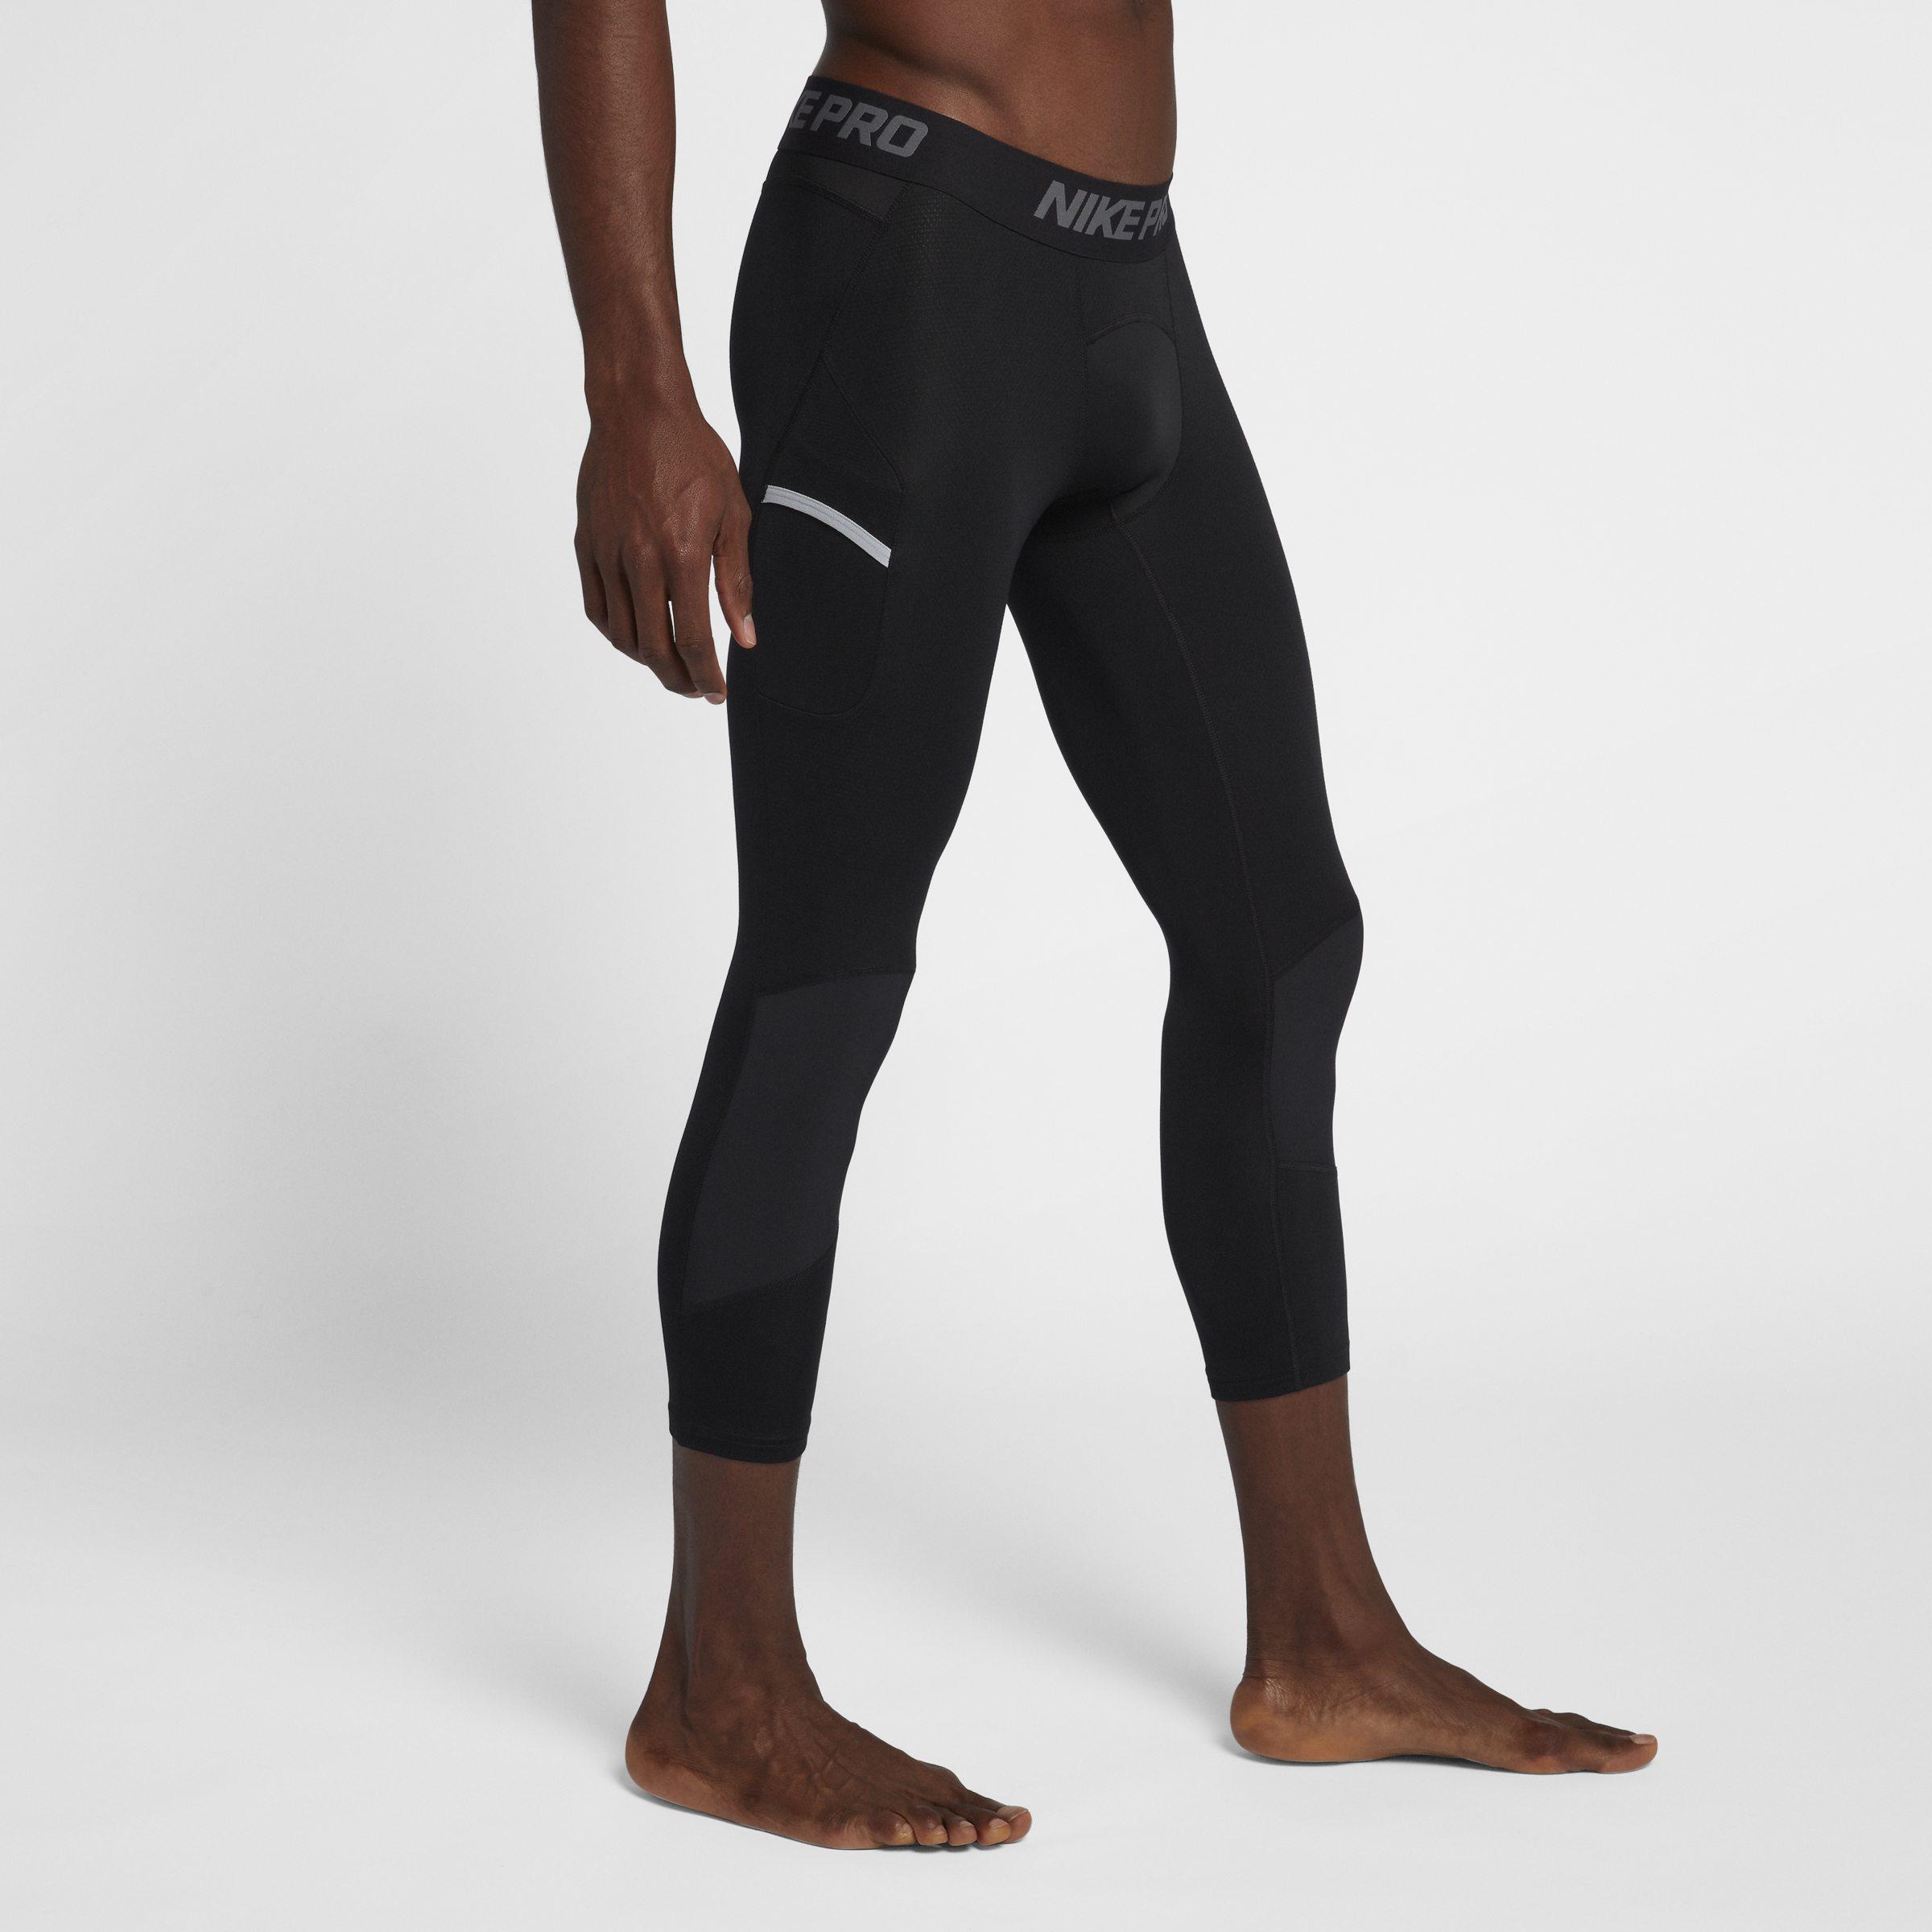 34d58b4467e24 Nike Pro Dri-fit Men's 3/4 Basketball Tights in Black for Men - Lyst